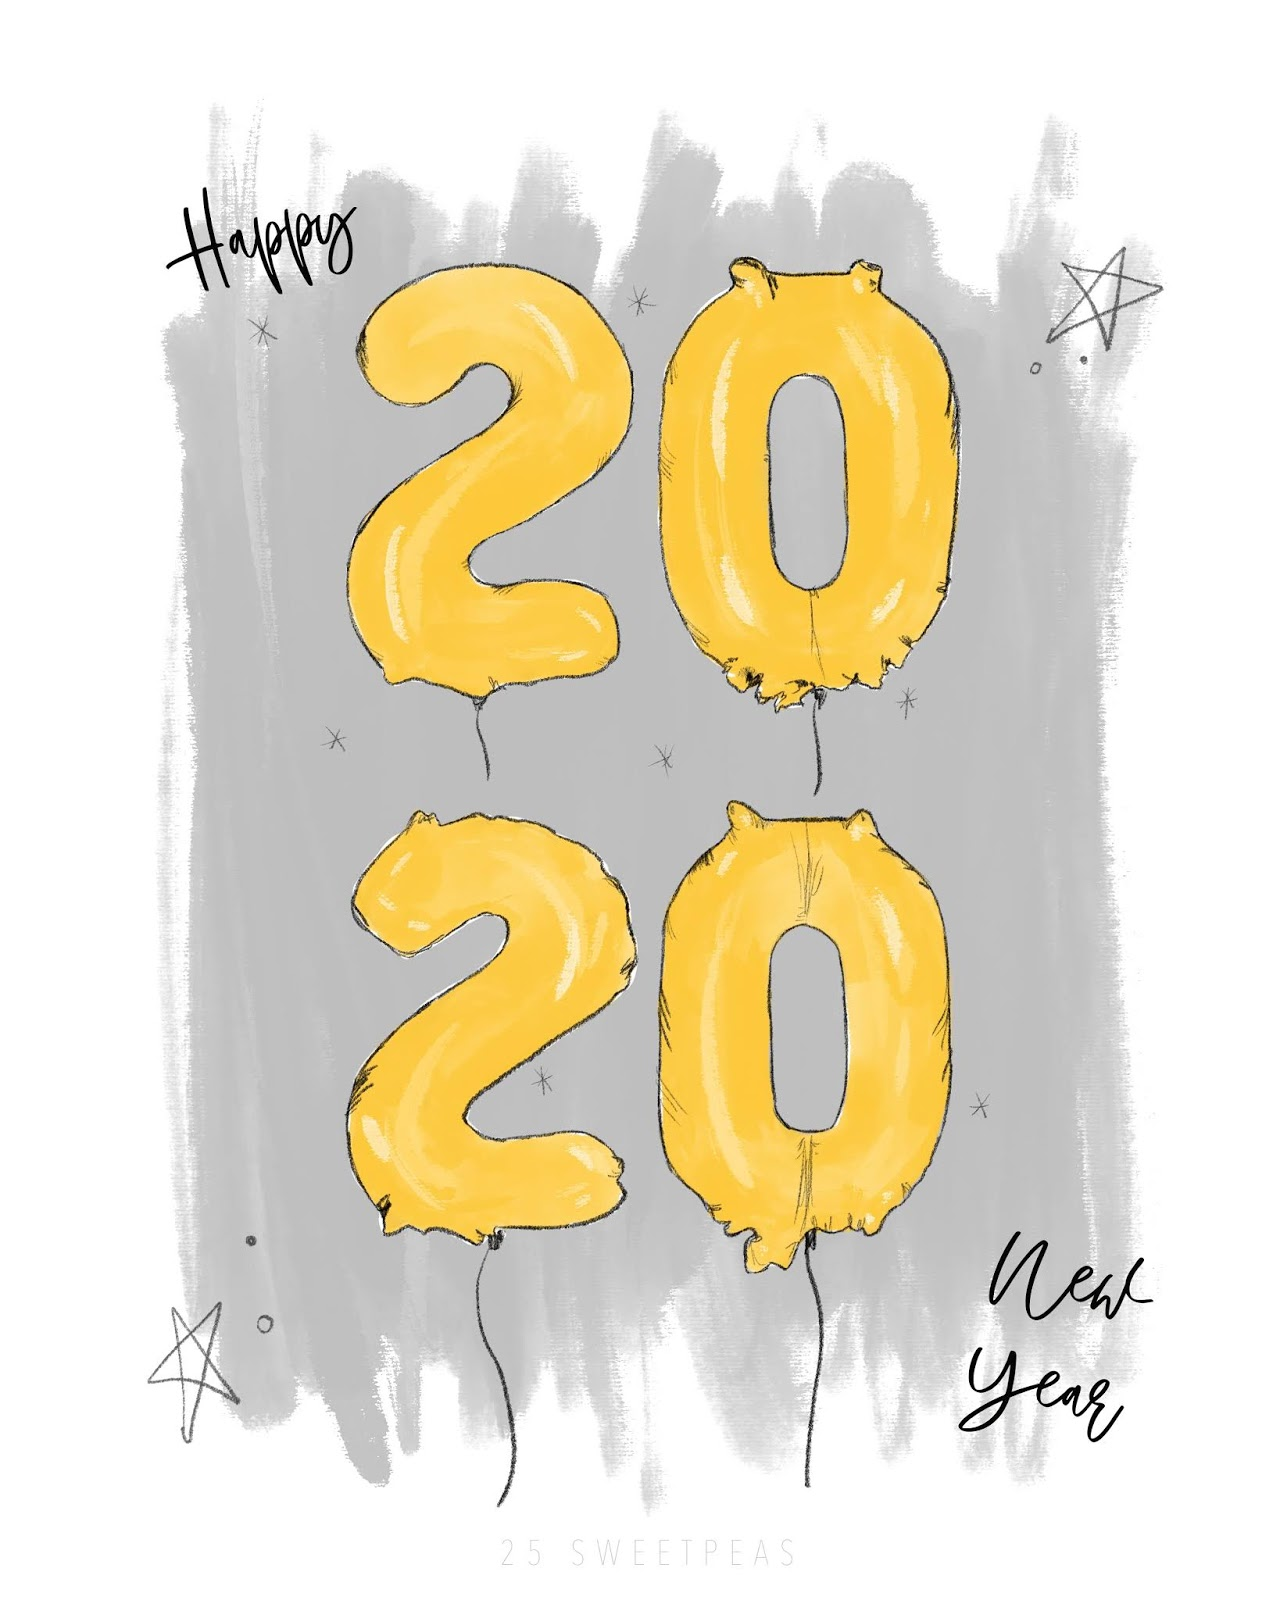 Happy New Years 2020 Illustration - 25 Sweetpeas